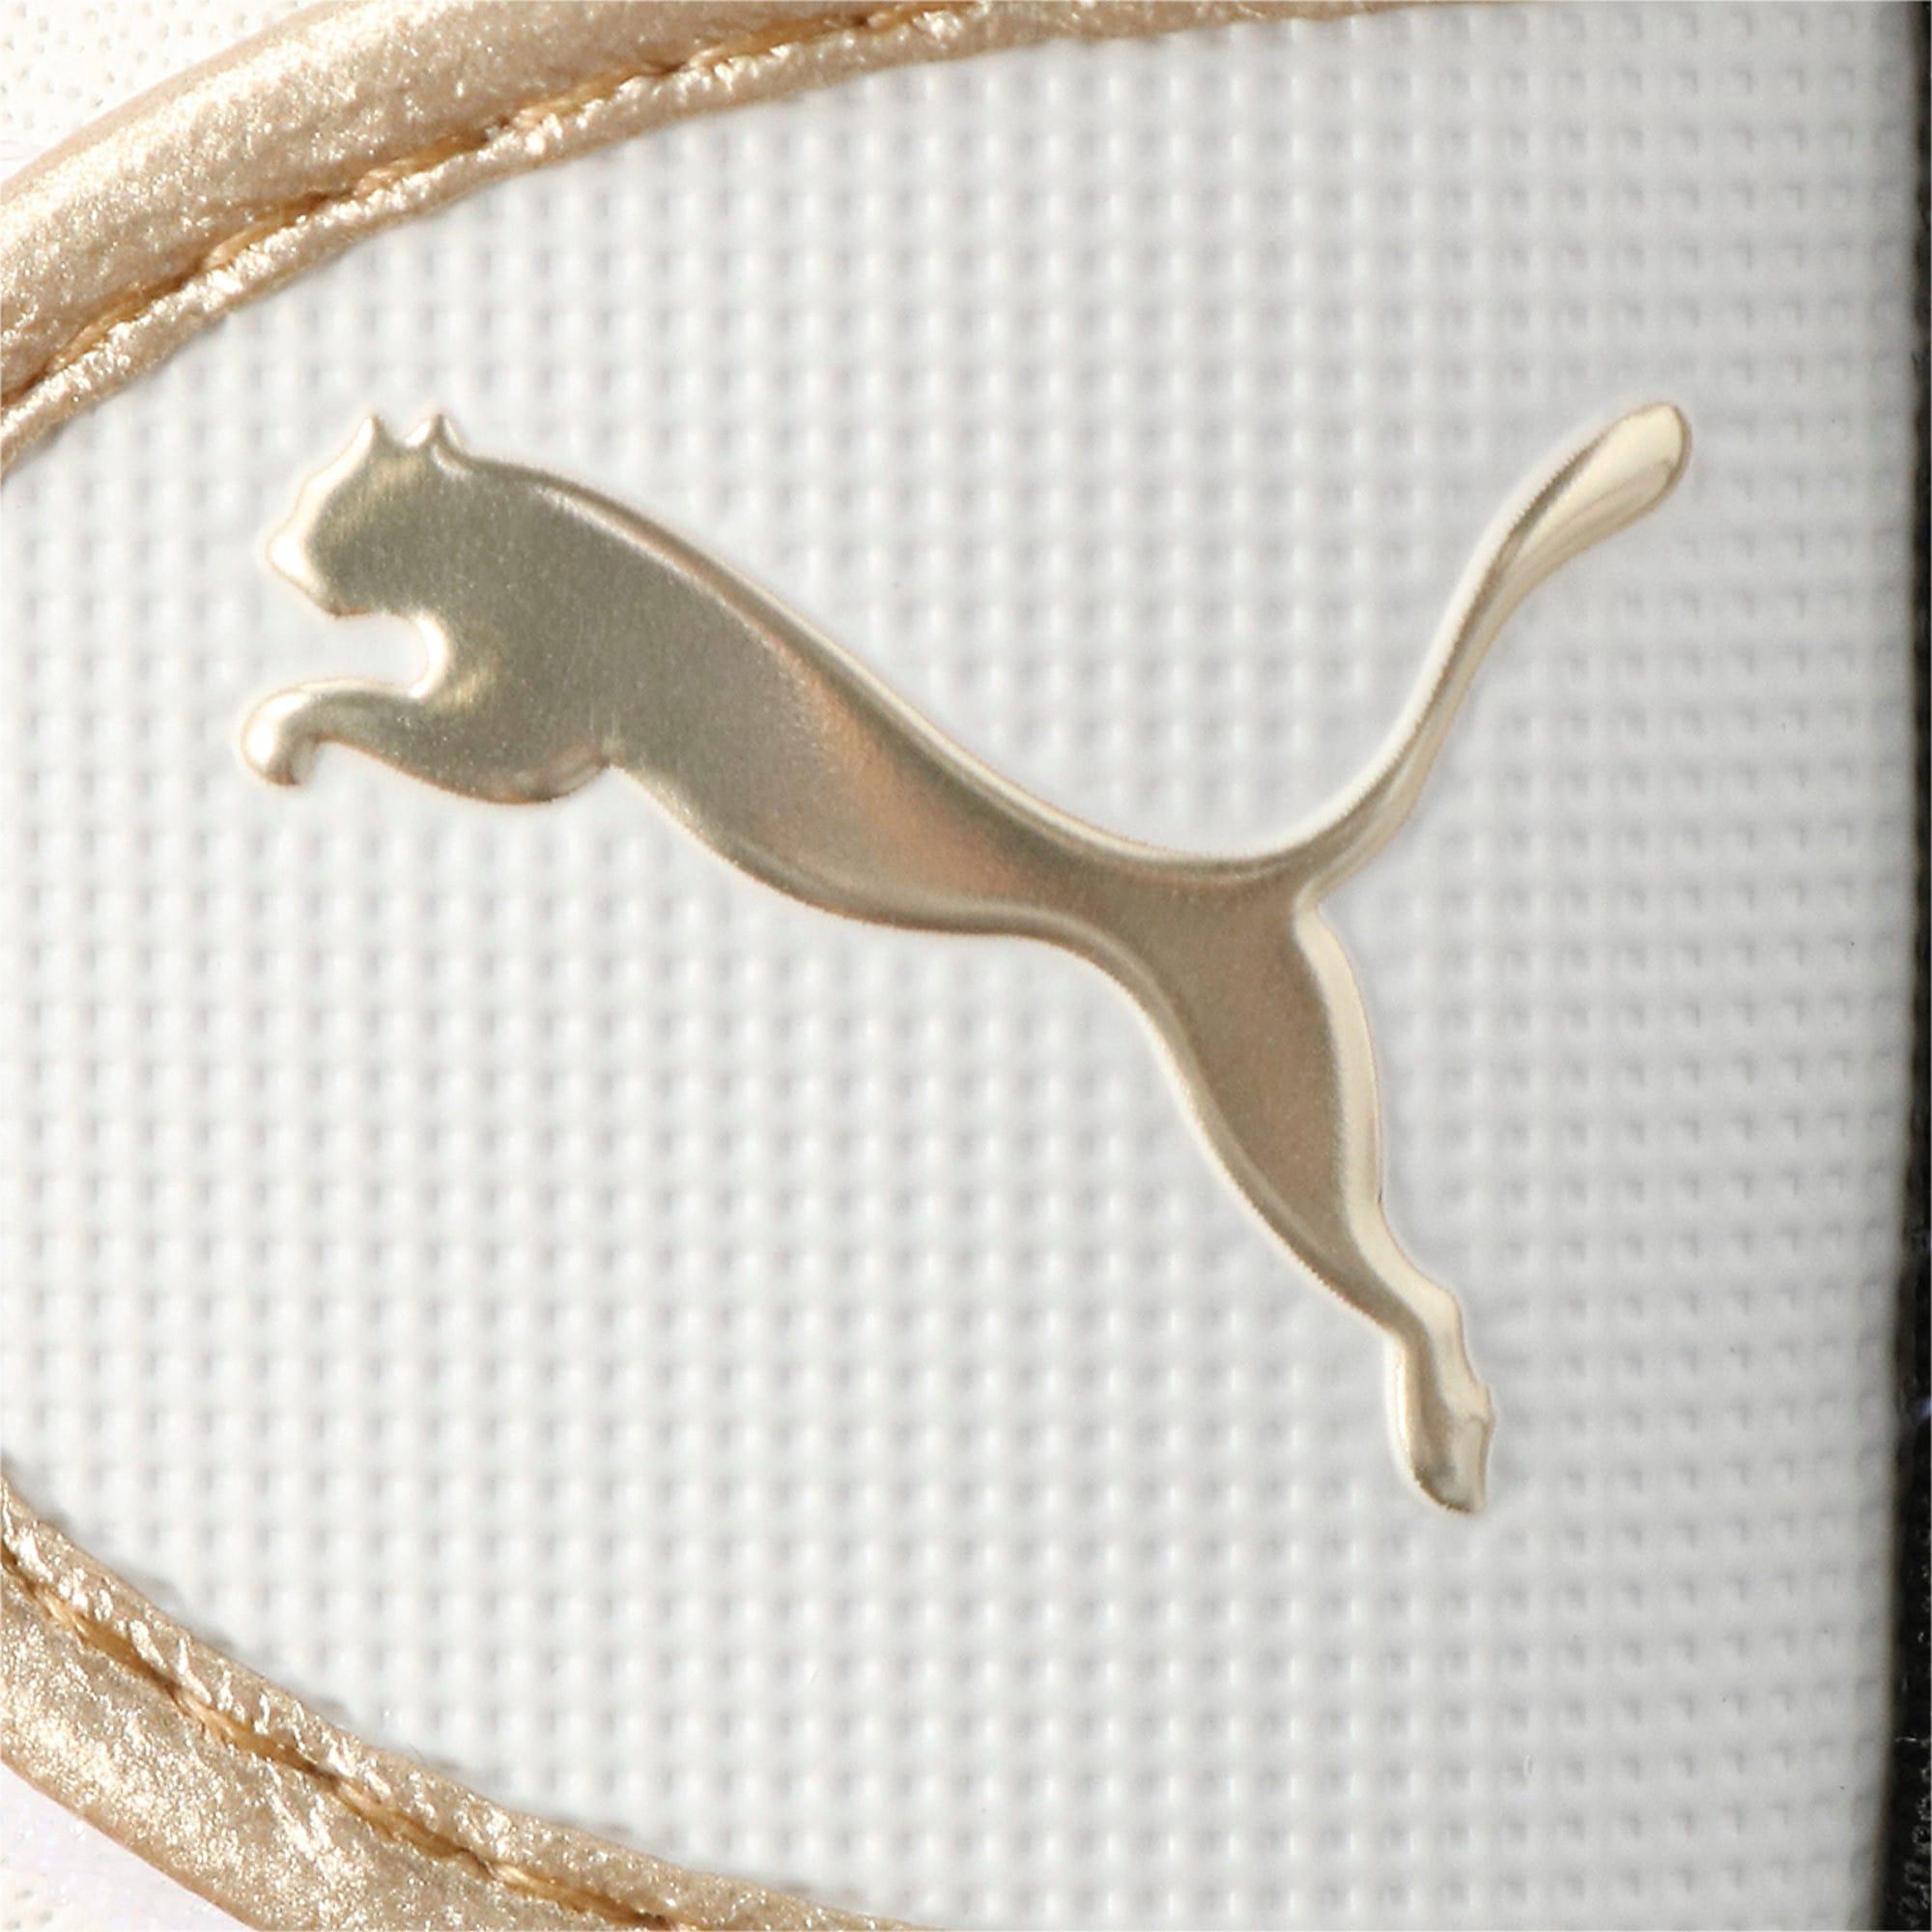 Thumbnail 3 of ゴルフ 3D ウィメンズ パフォーマンス グローブ 両手用, White / Puma Black, medium-JPN